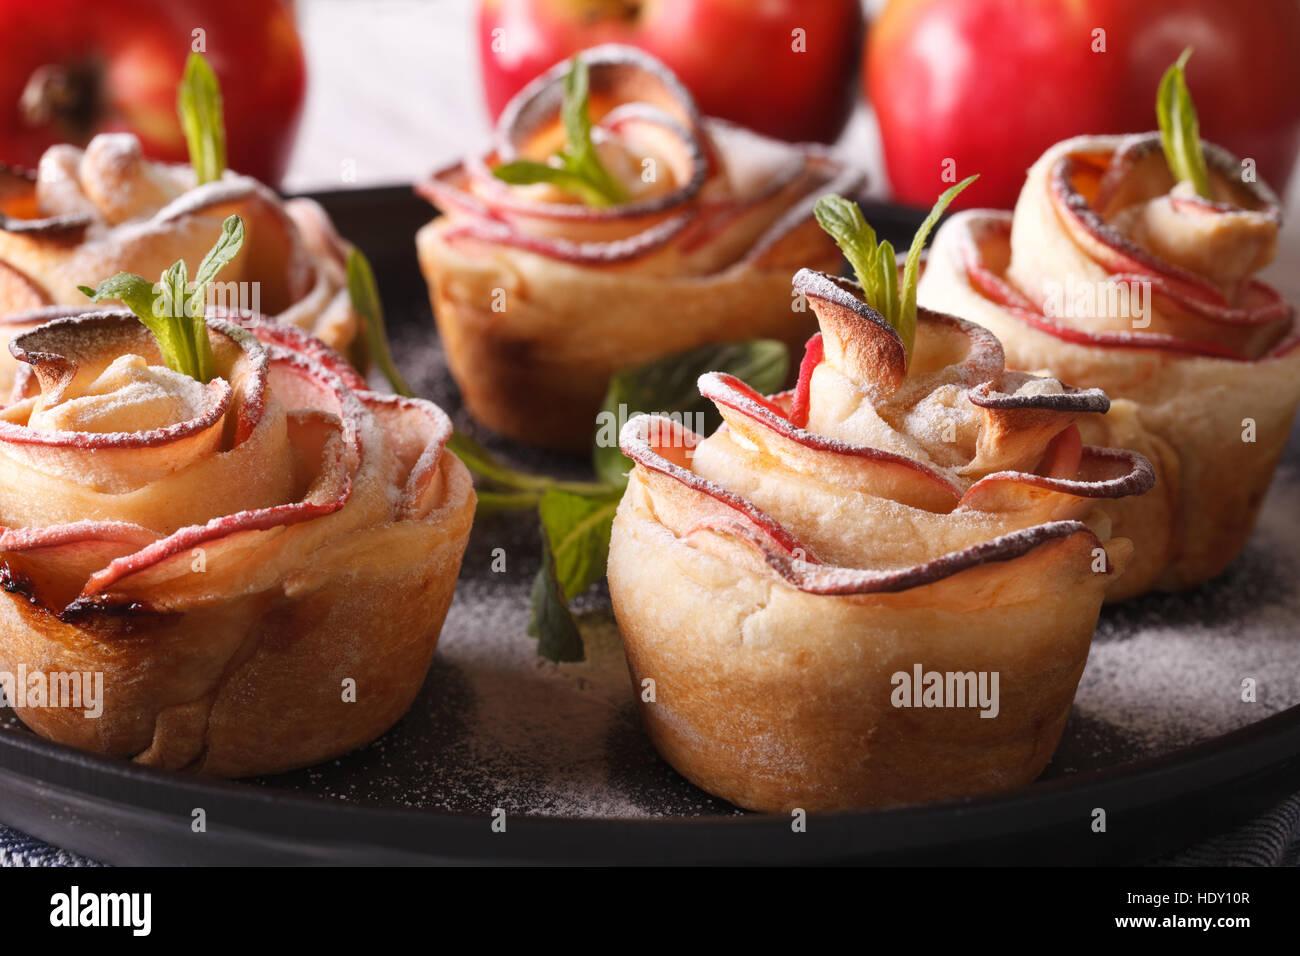 Apfelkuchen in Form von Rosen. Festliche Gebäck, horizontale Makro Stockbild